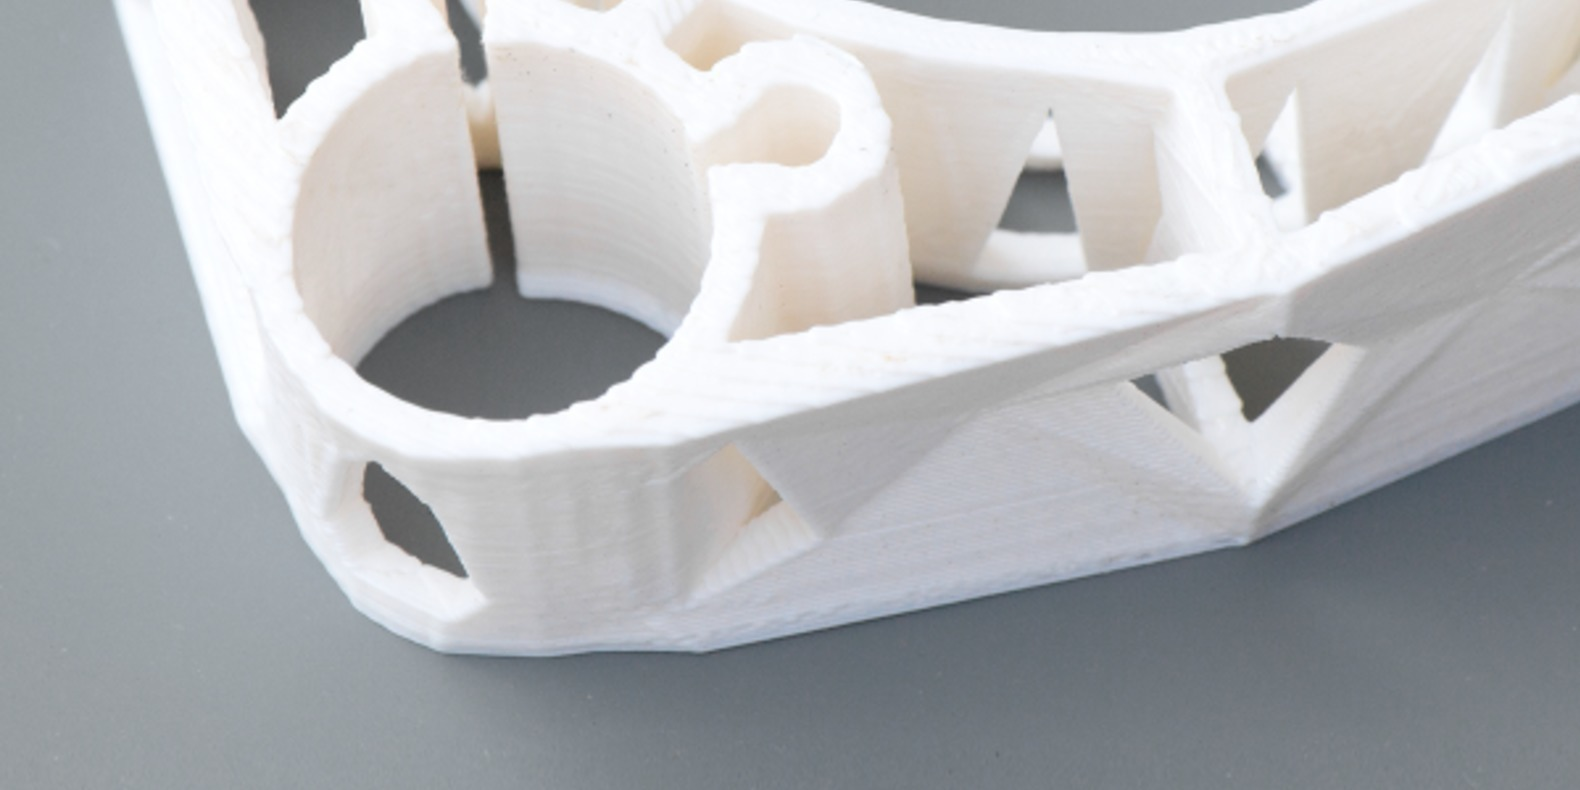 besenthal_02 besenthal_04 MYO lampe imprimée en 3D lamp 3D printing impression 3D